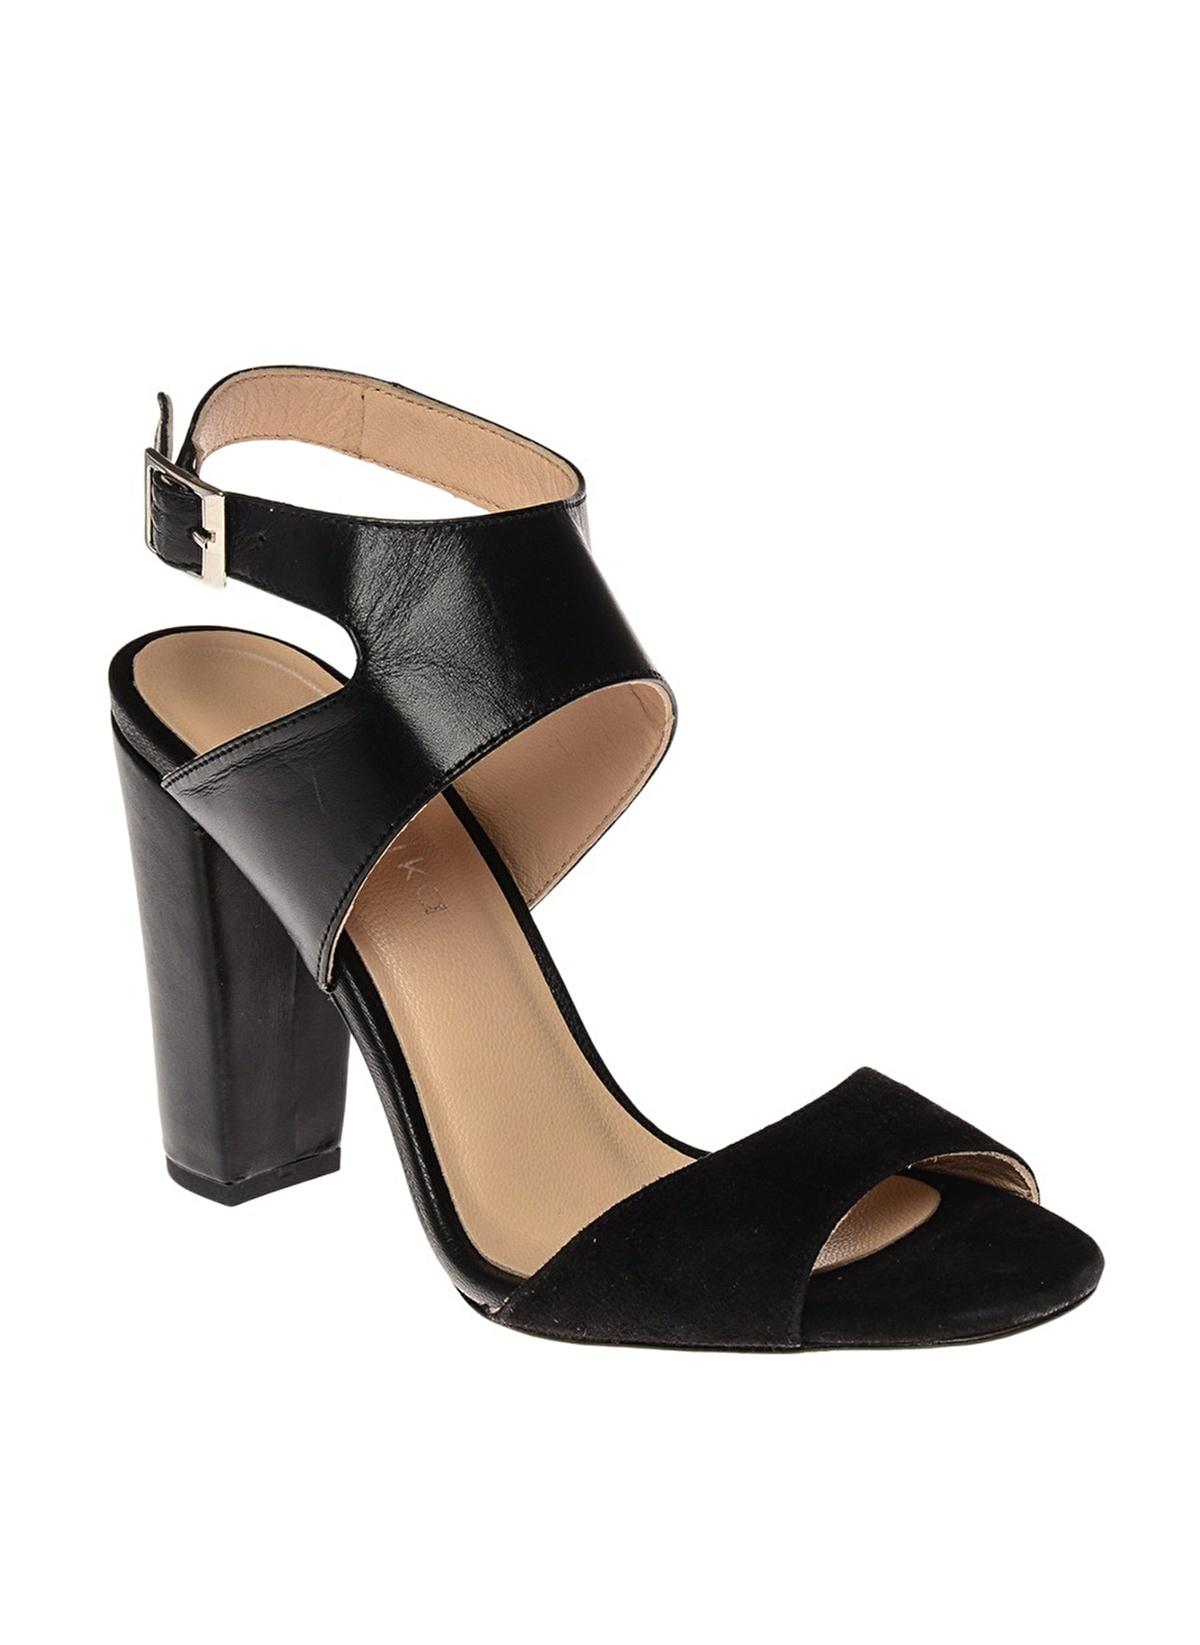 Fabrika Ayakkabı 71der Shilka Sandalet  K – 159.99 TL